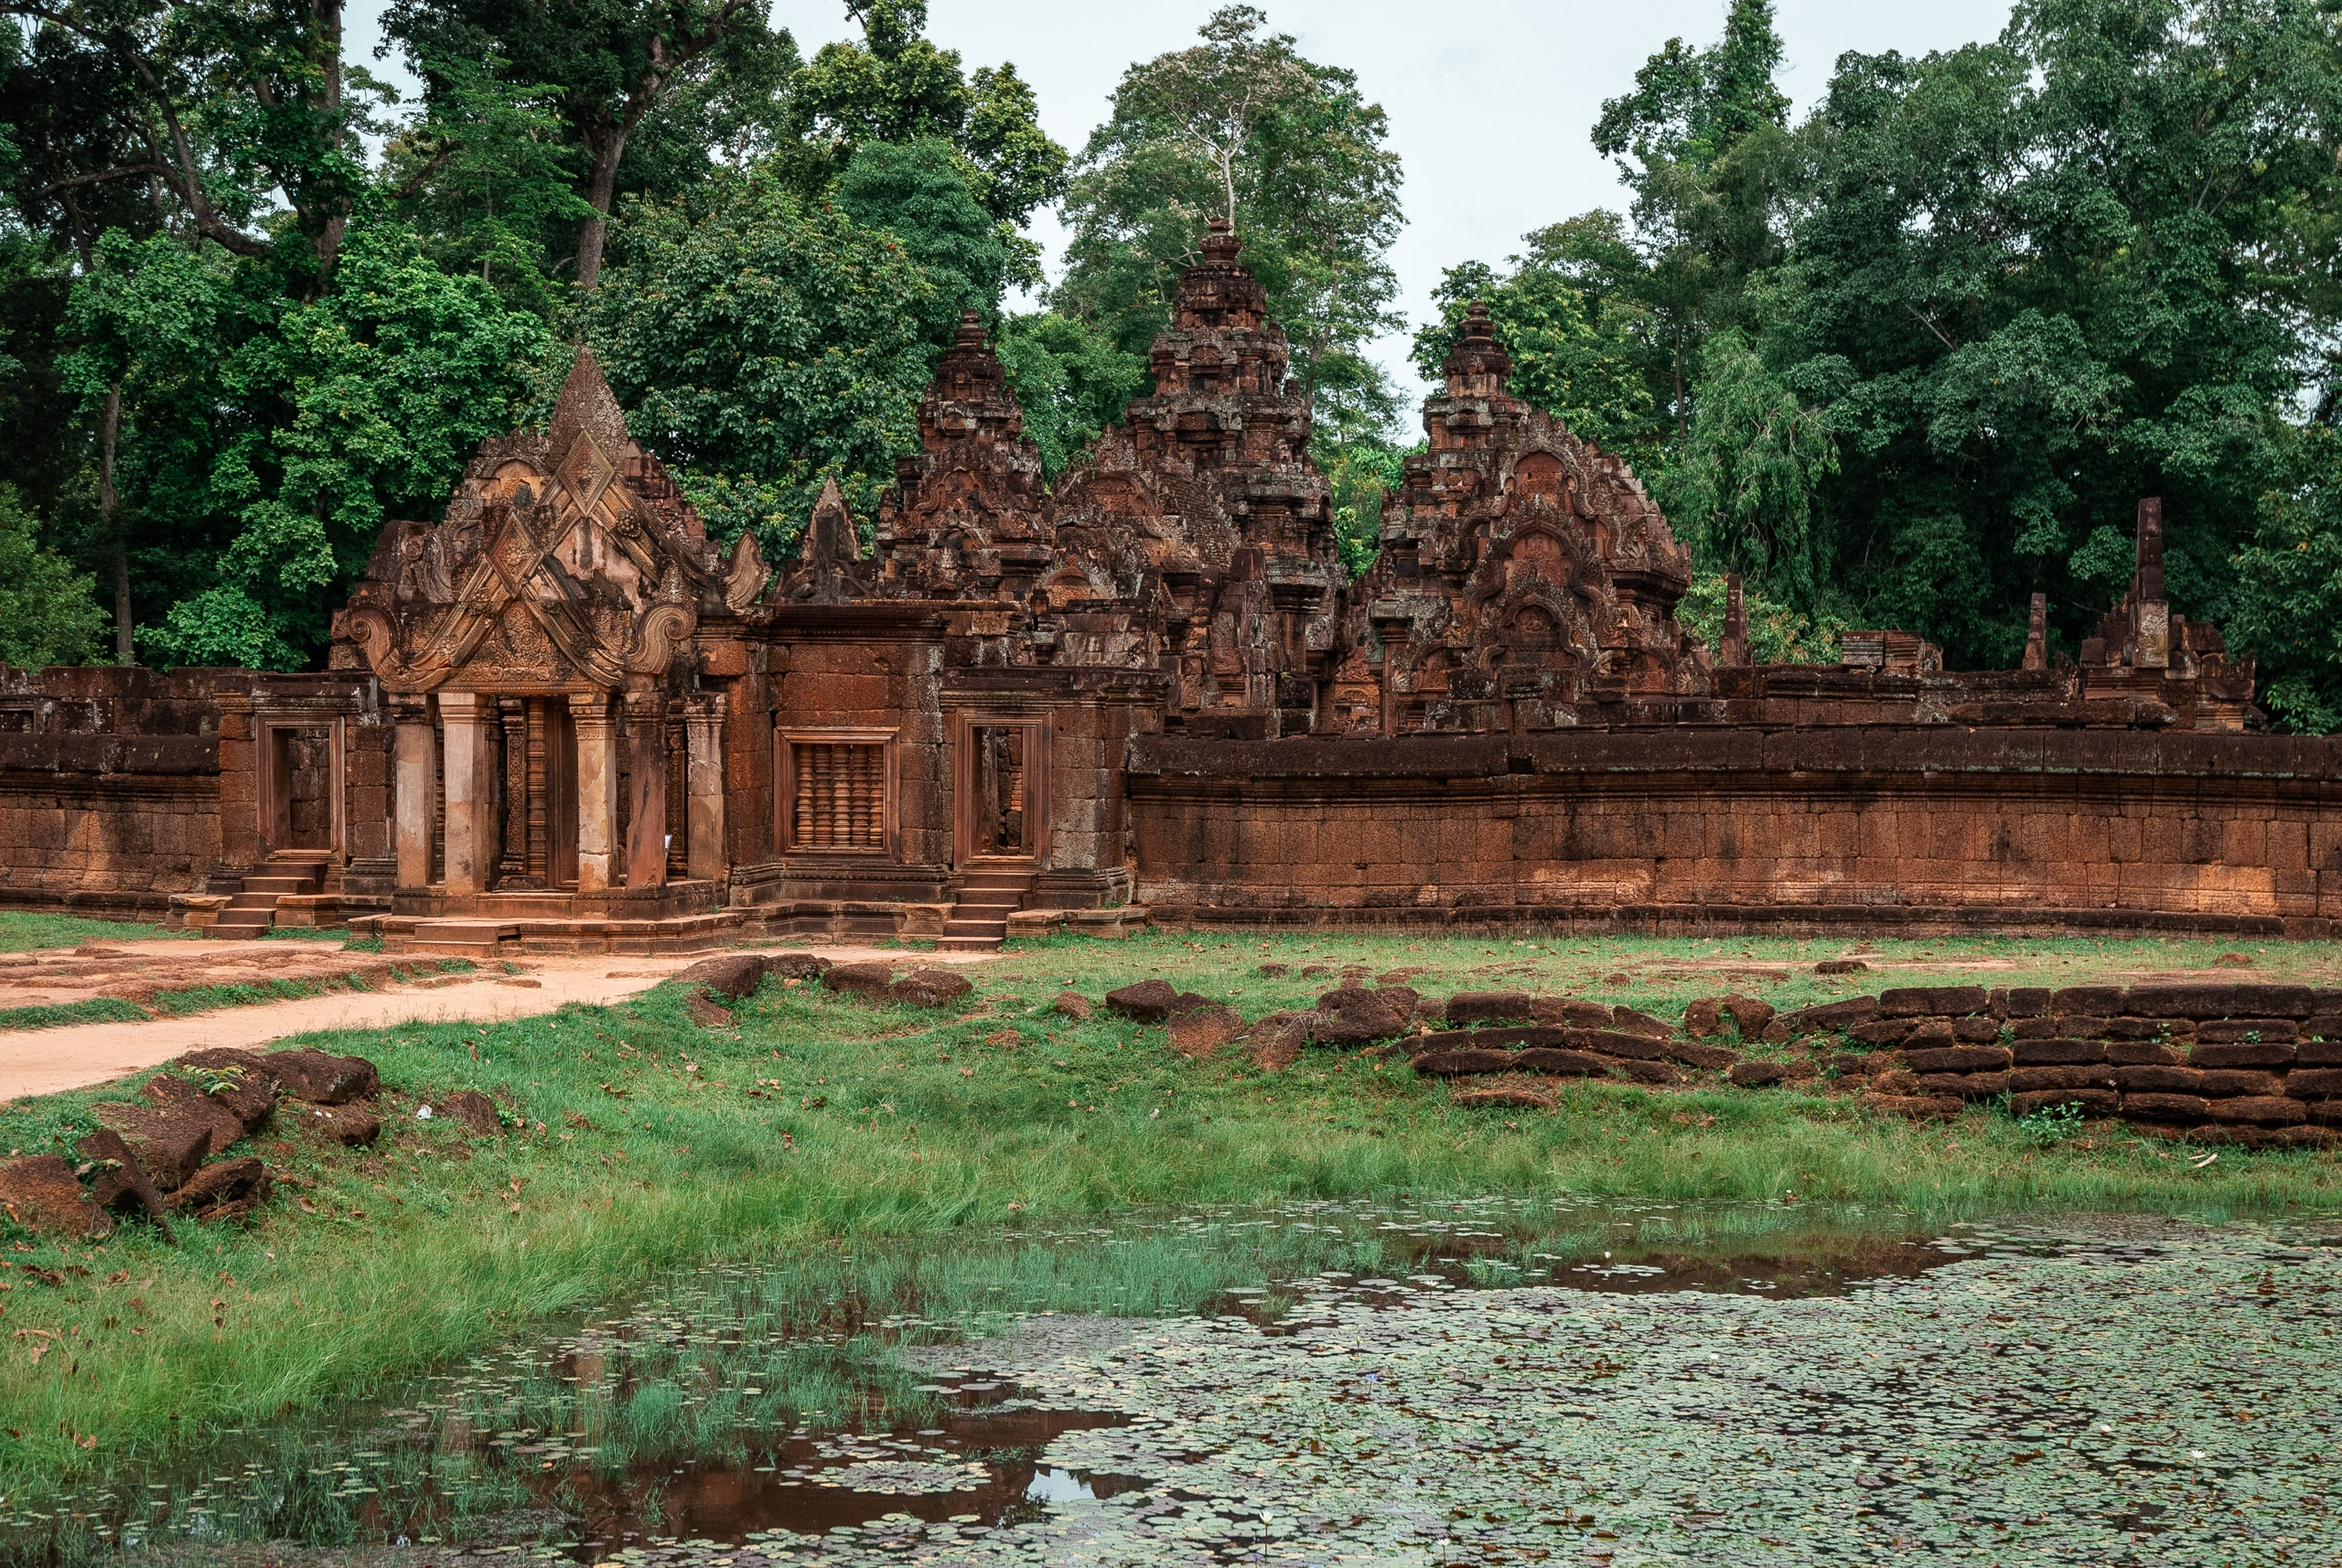 Cambodia - Angkor Wat - 2007-0627-DSC_0019_118319